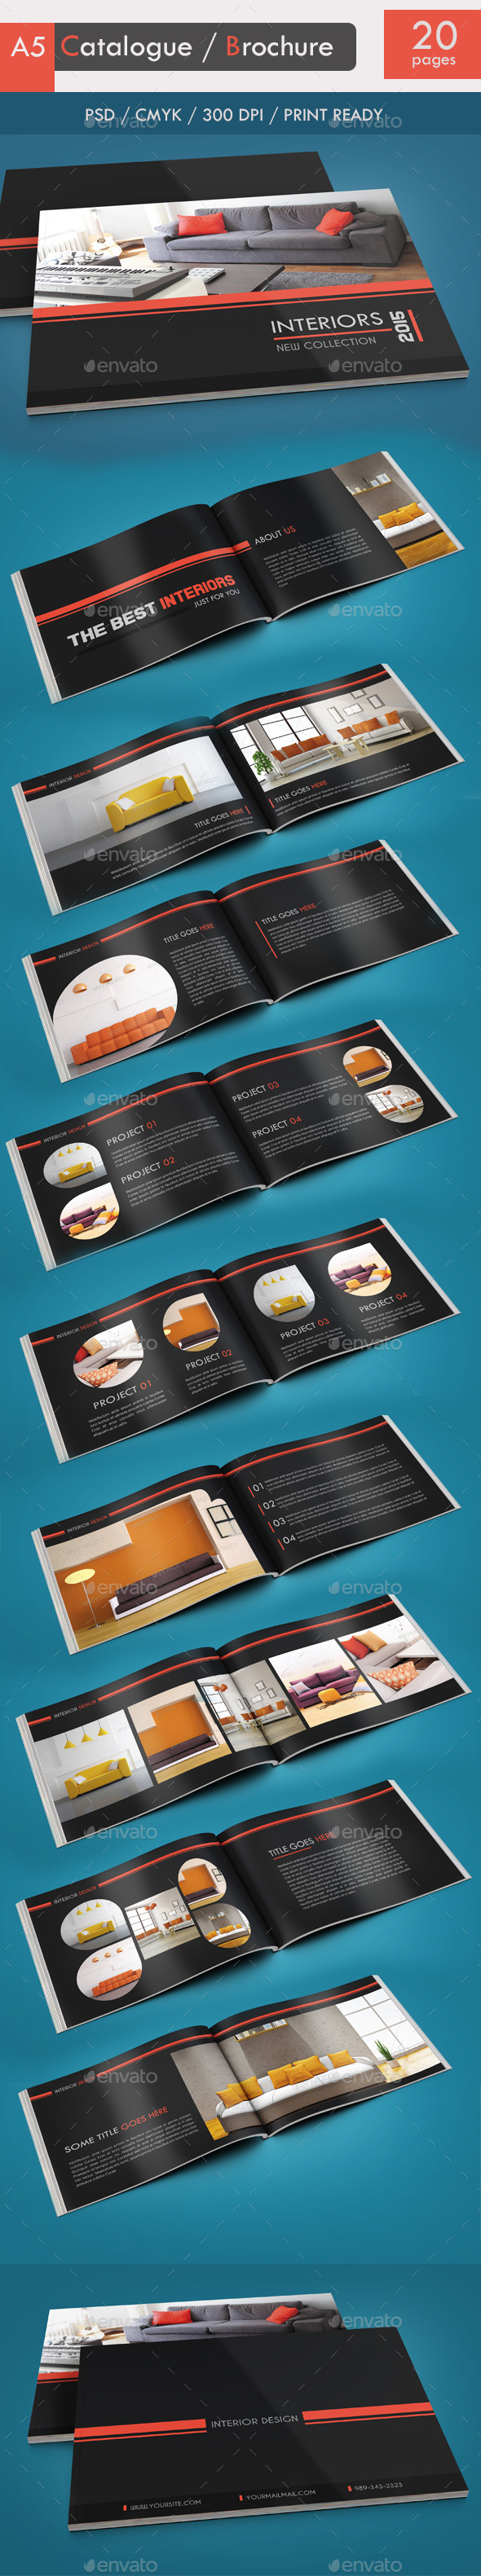 Catalogue/Brochure - Catalogs Brochures